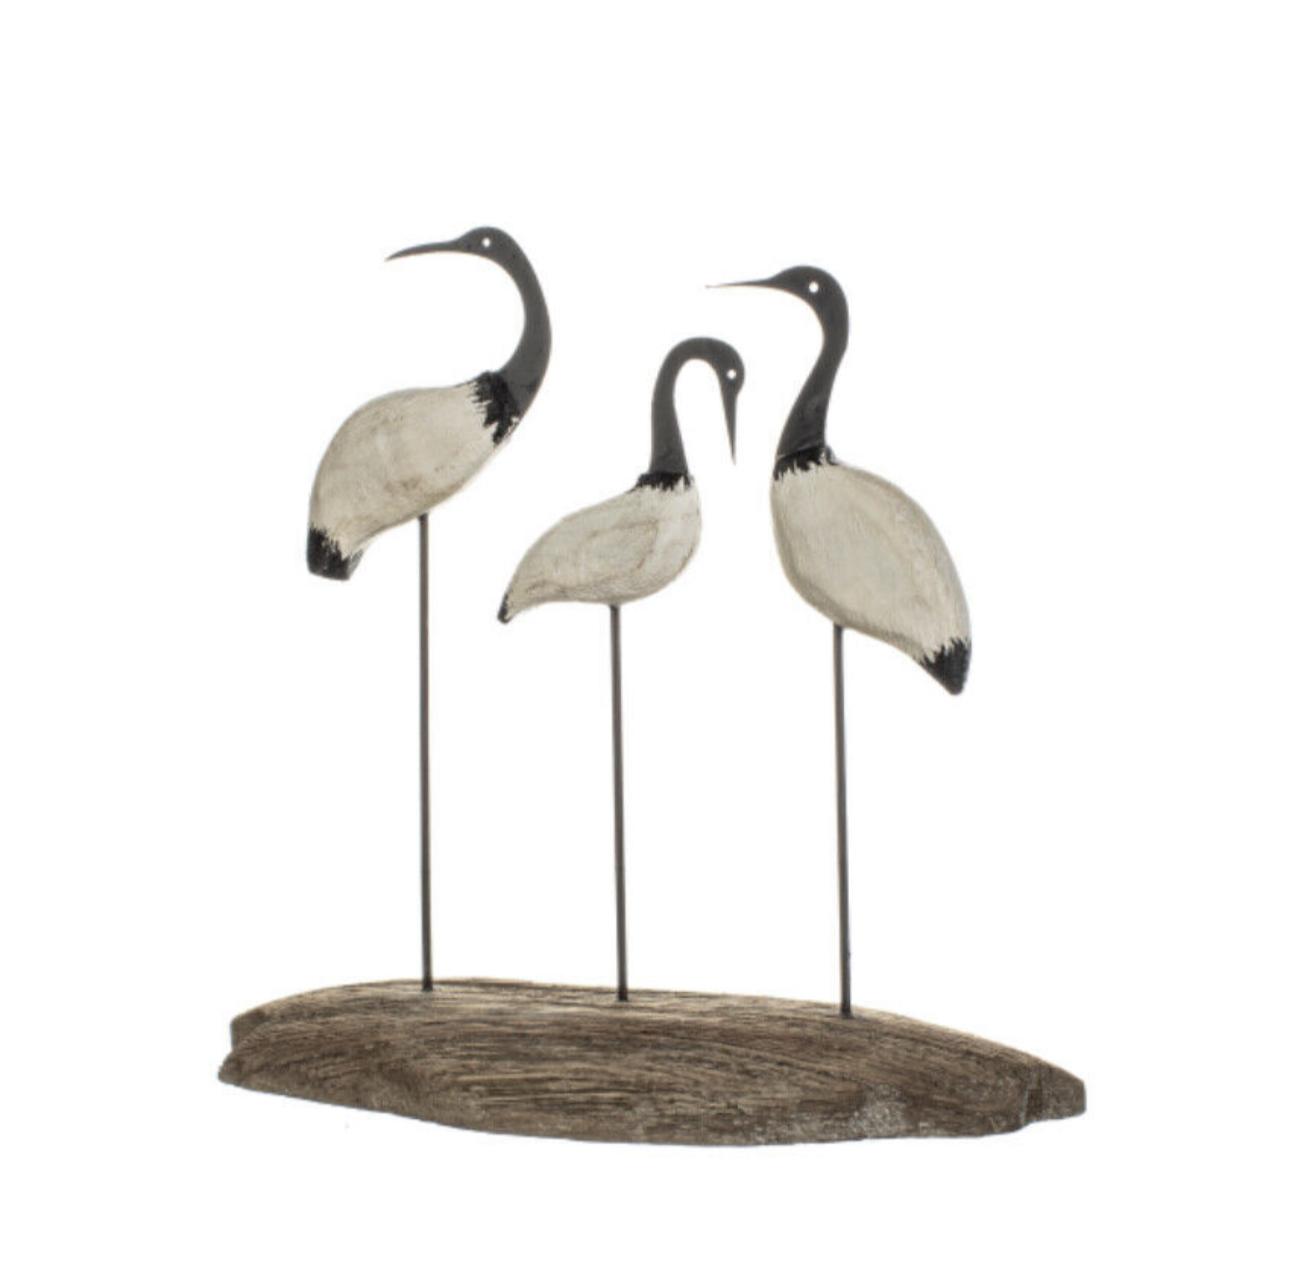 Three shore birds on wood, ornament by shoeless joe